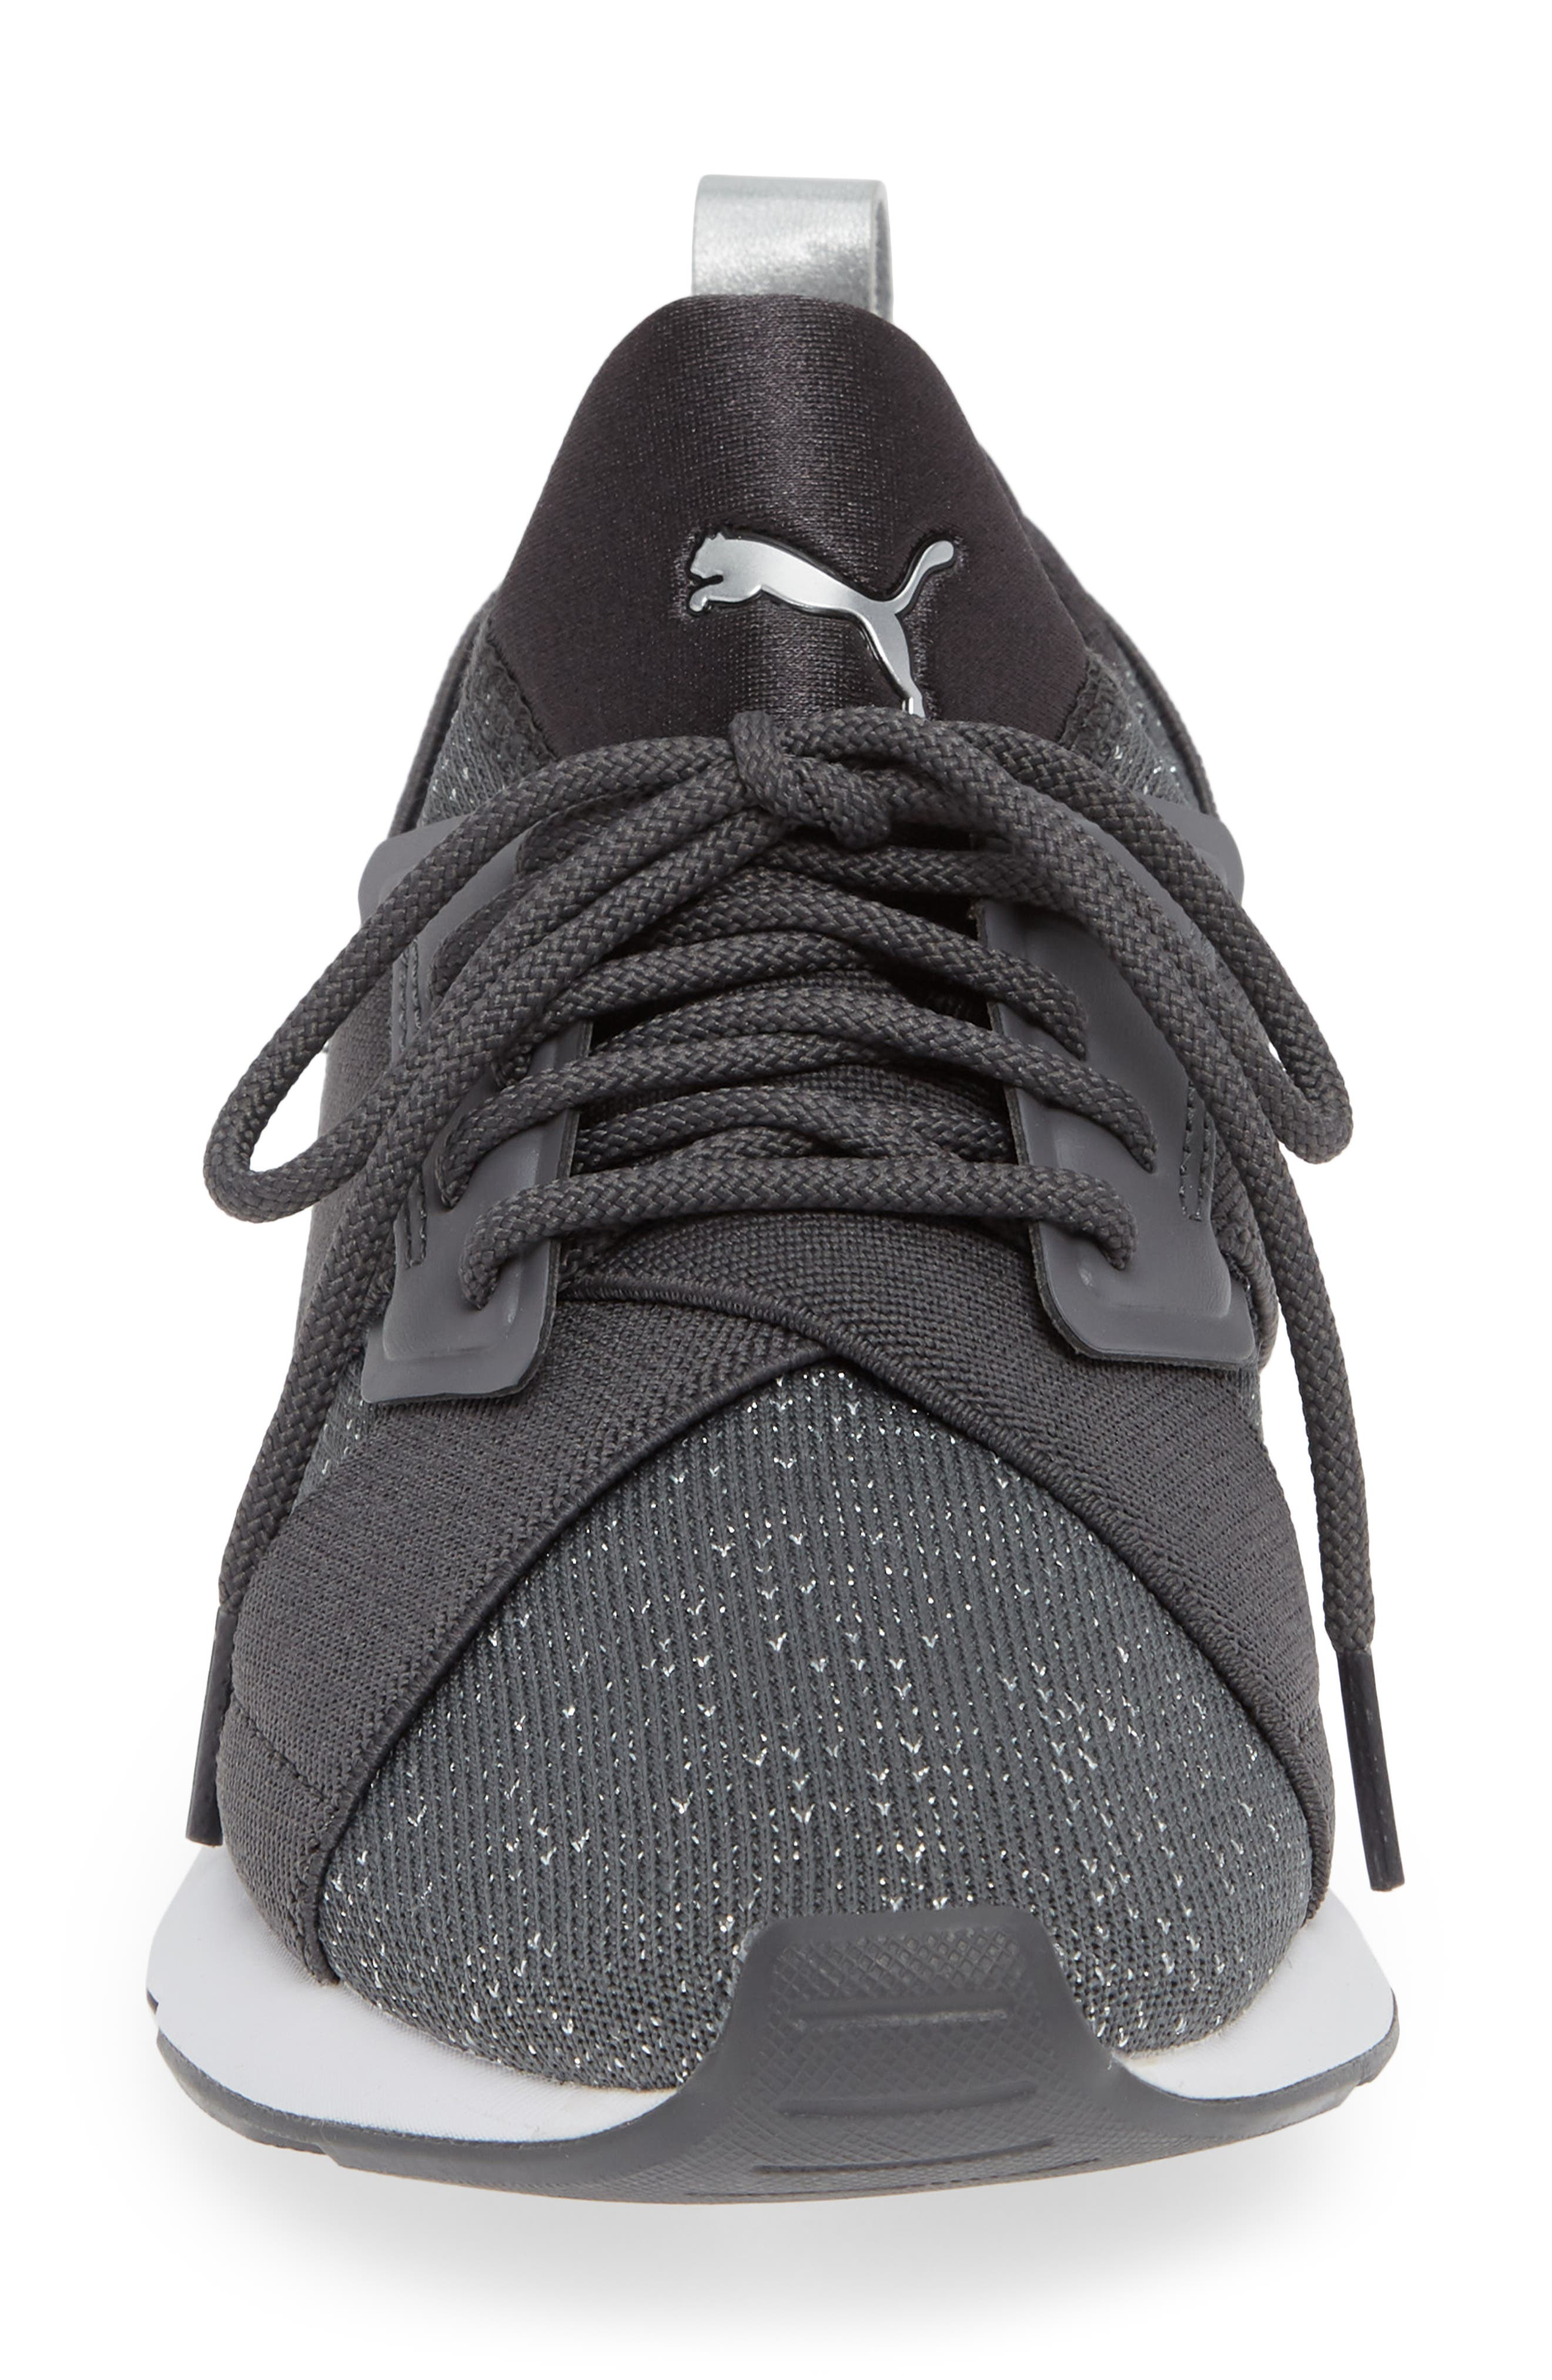 Muse Knit Sneaker,                             Alternate thumbnail 4, color,                             IRON GATE